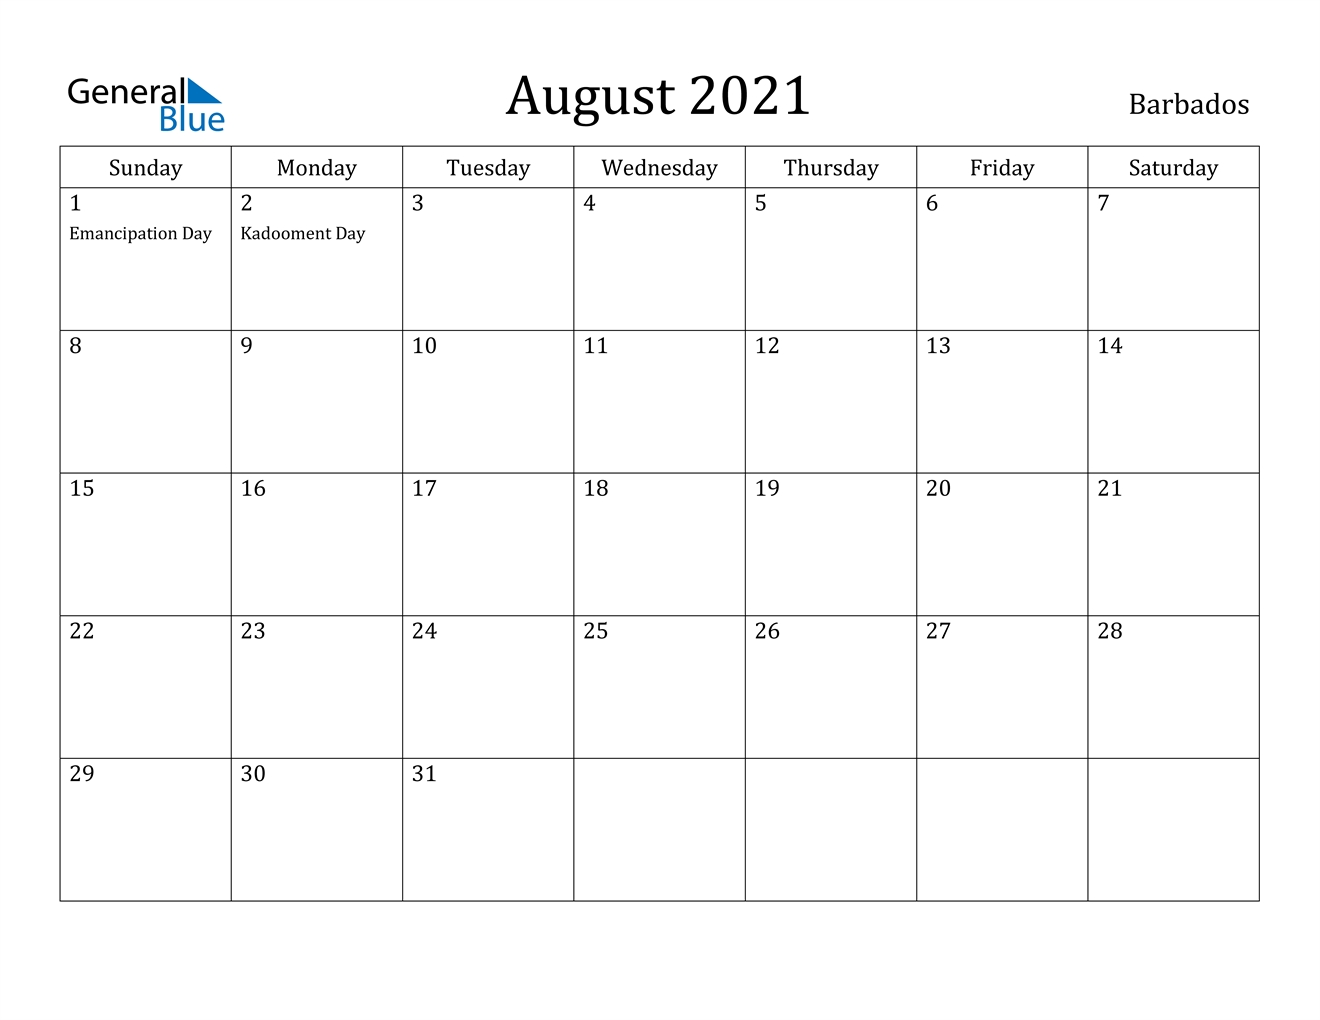 August 2021 Calendar - Barbados August 2021 Calendar With Holidays Usa